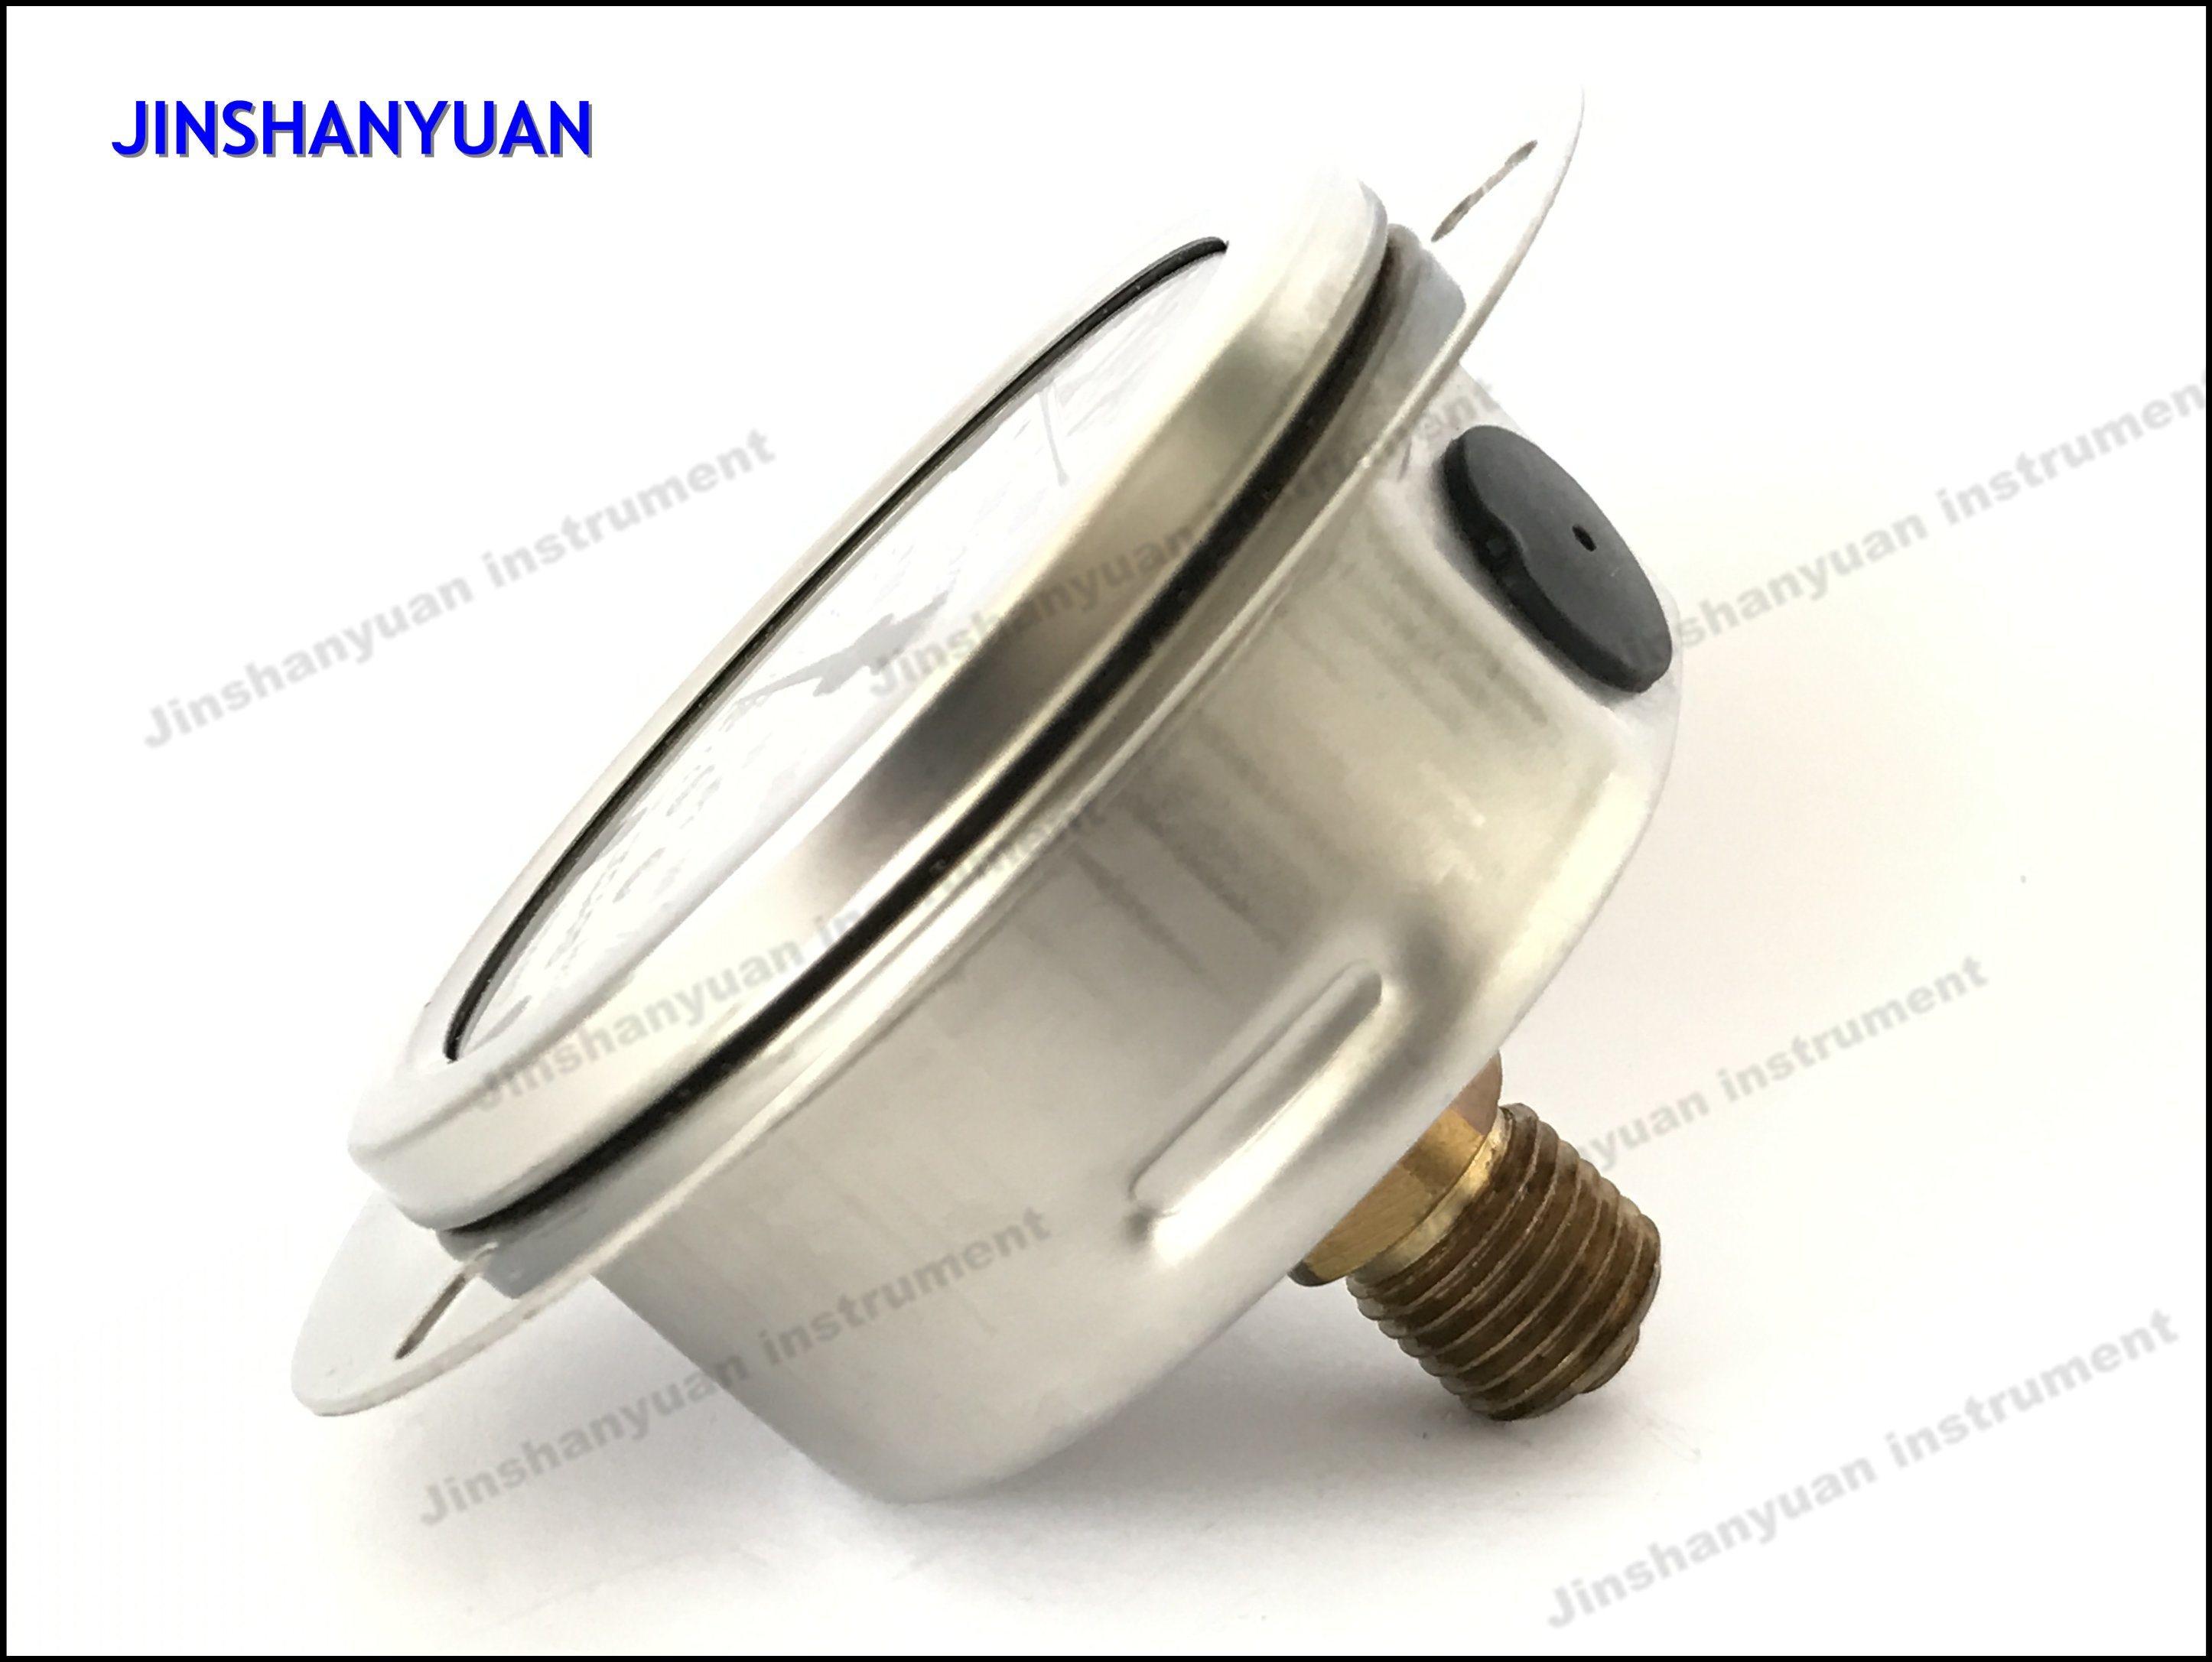 Og-016 Wika Type Pressure Gauge/Pressure Gauge with Front Clamp/Back Type Manometer